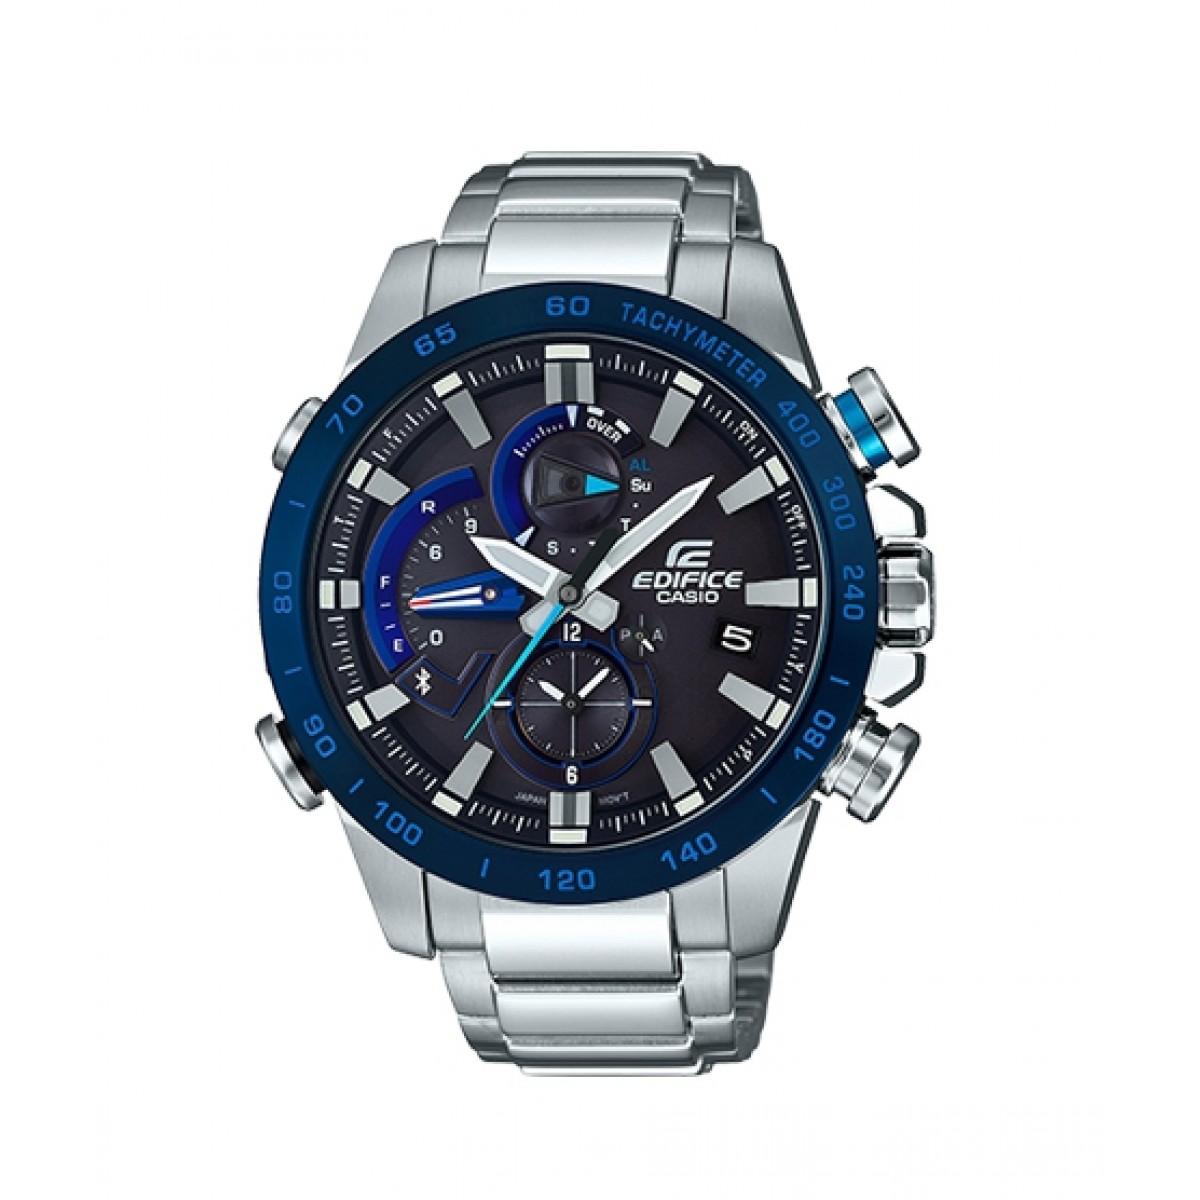 Casio Edifice Men's Watch (EQB800DB-1A)